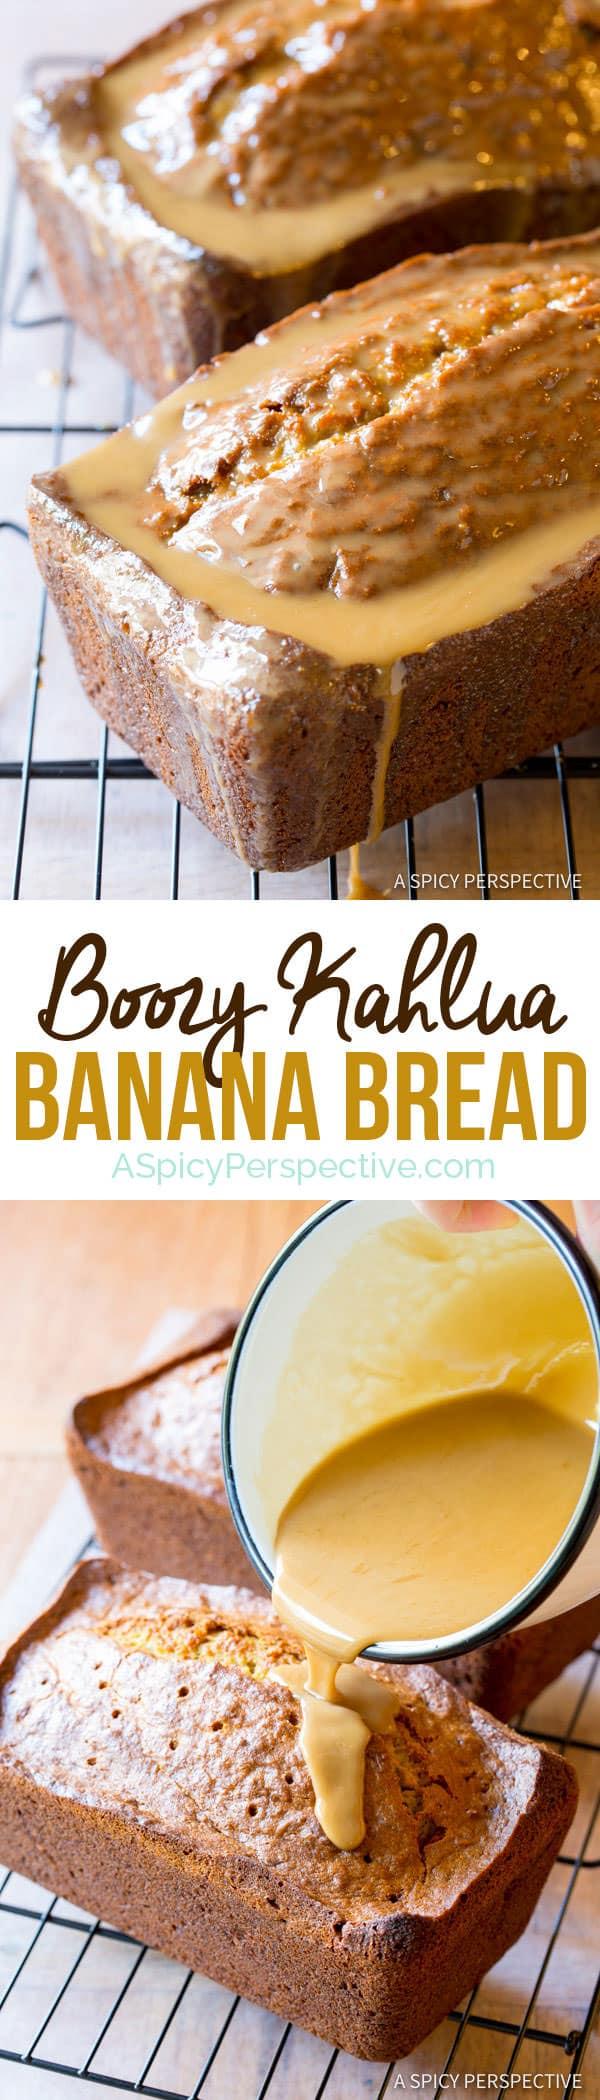 Boozy Kahlua Banana Bread | ASpicyPerspective.com